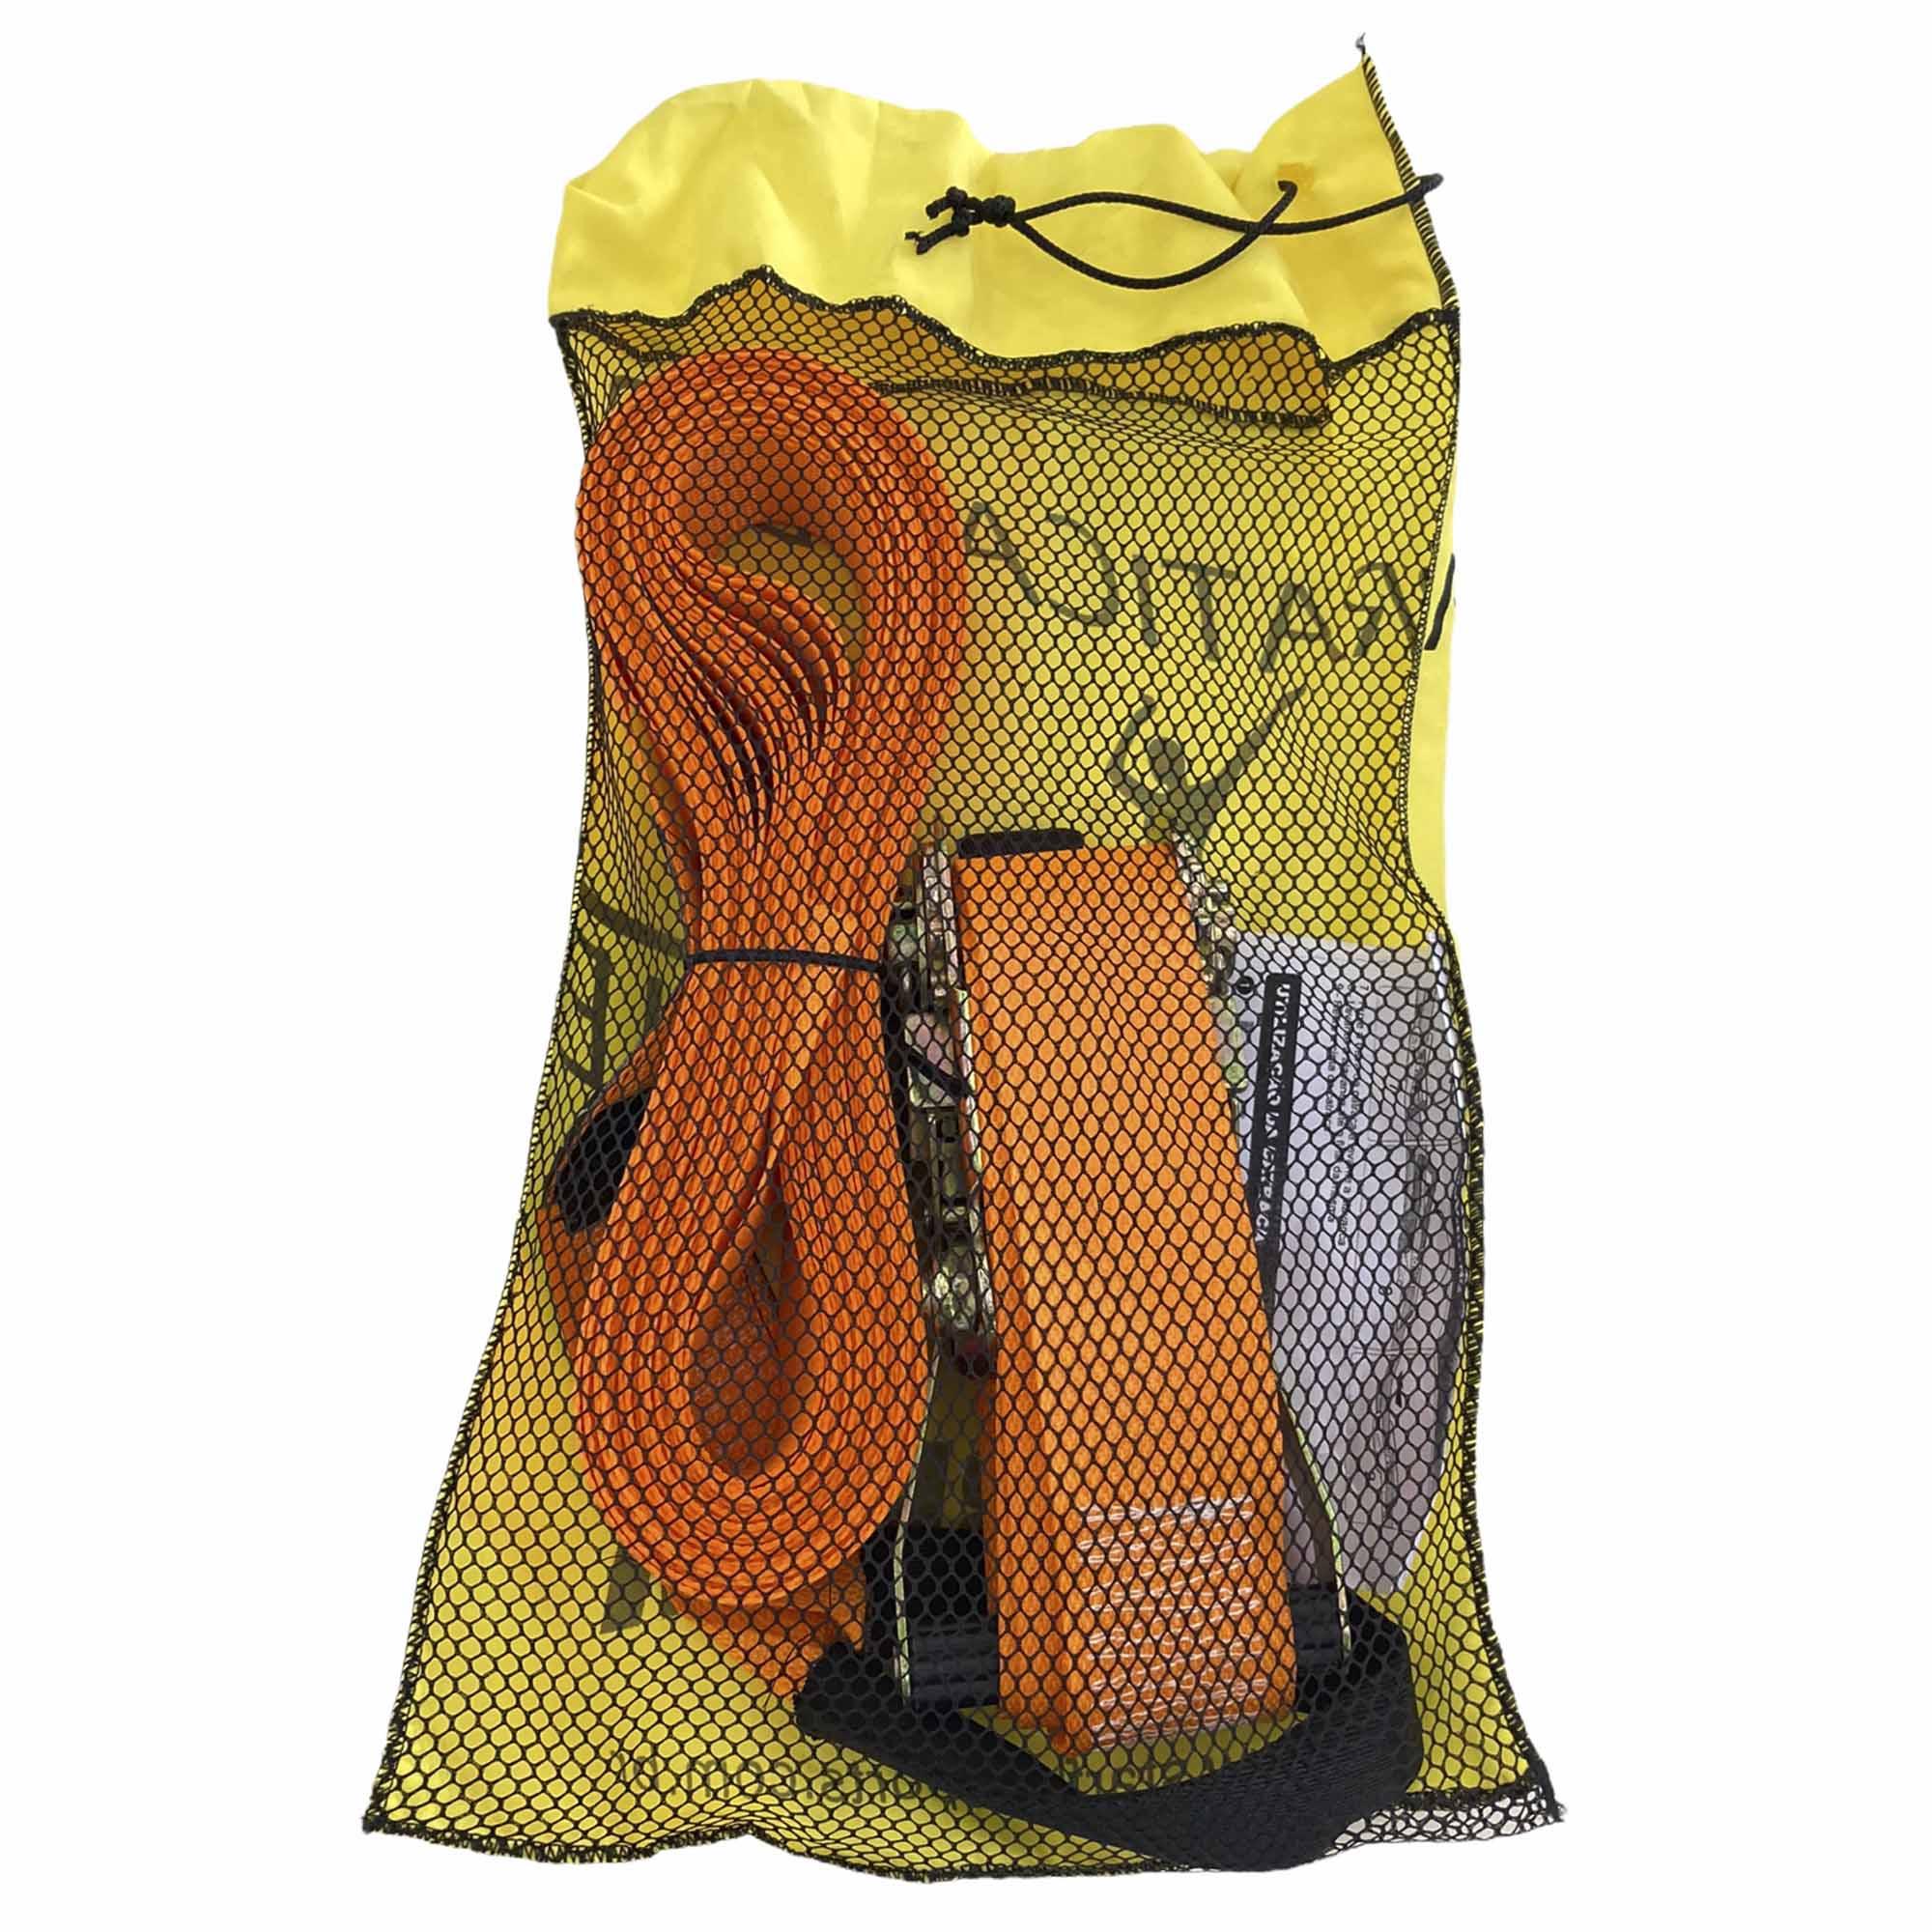 Slackline Kit Completo 10 Metros + Protetor E Bolsa